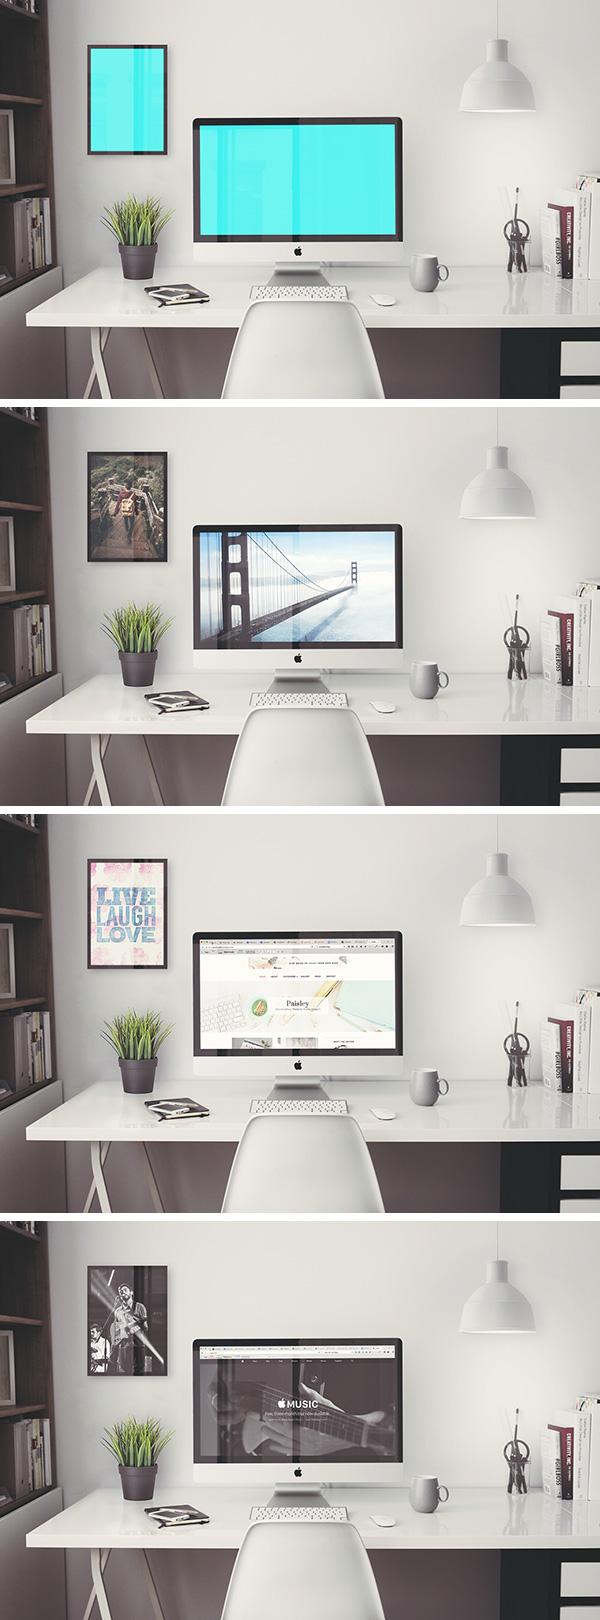 iMac Retina 5k Office Free PSD MockUp